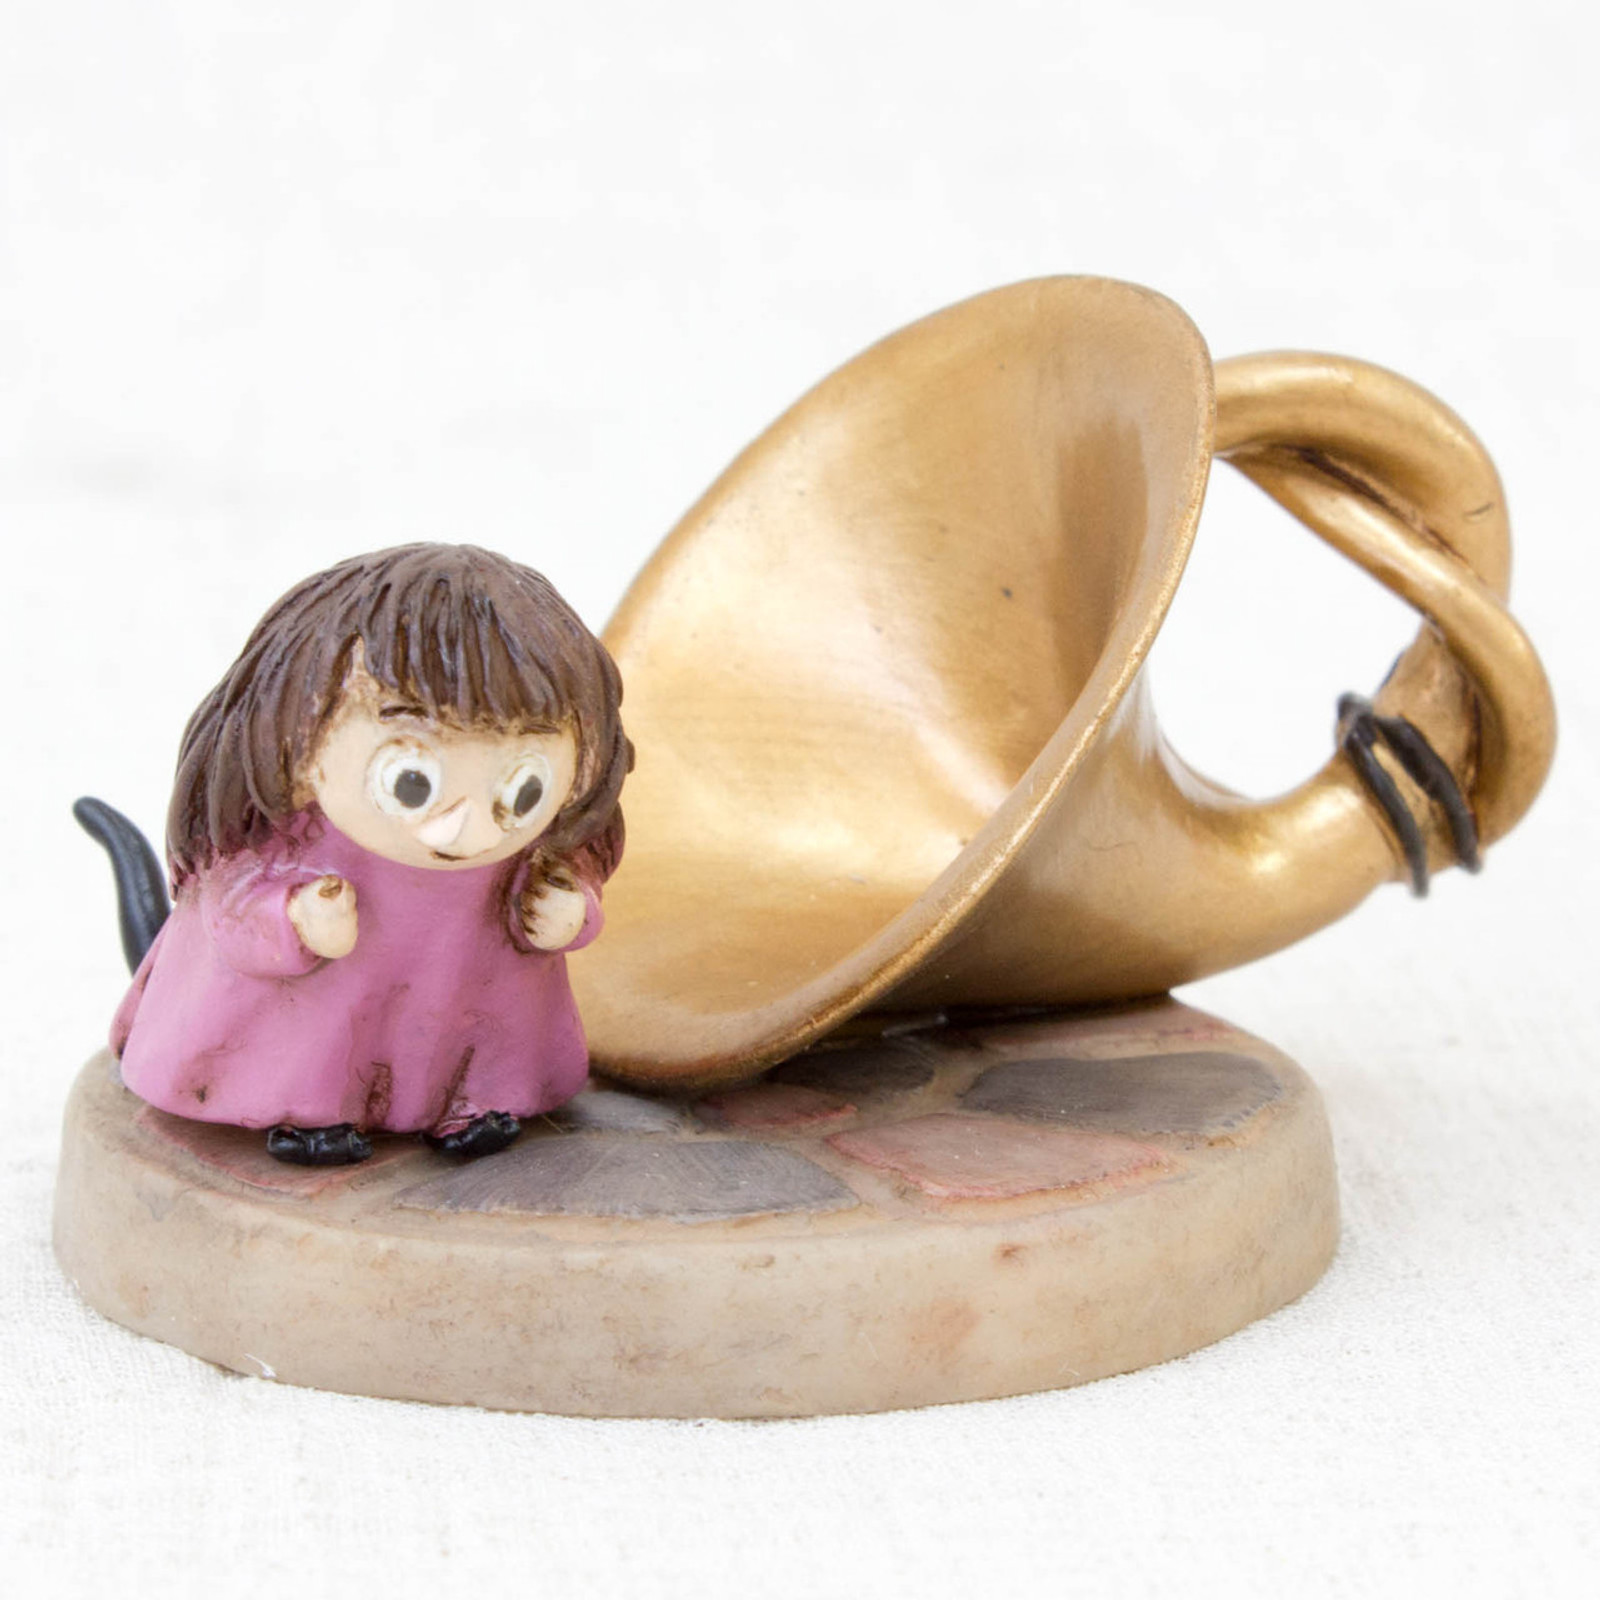 RARE! Moomin Characters Salome Original Comics Ver. Mini Figure Benelic JAPAN